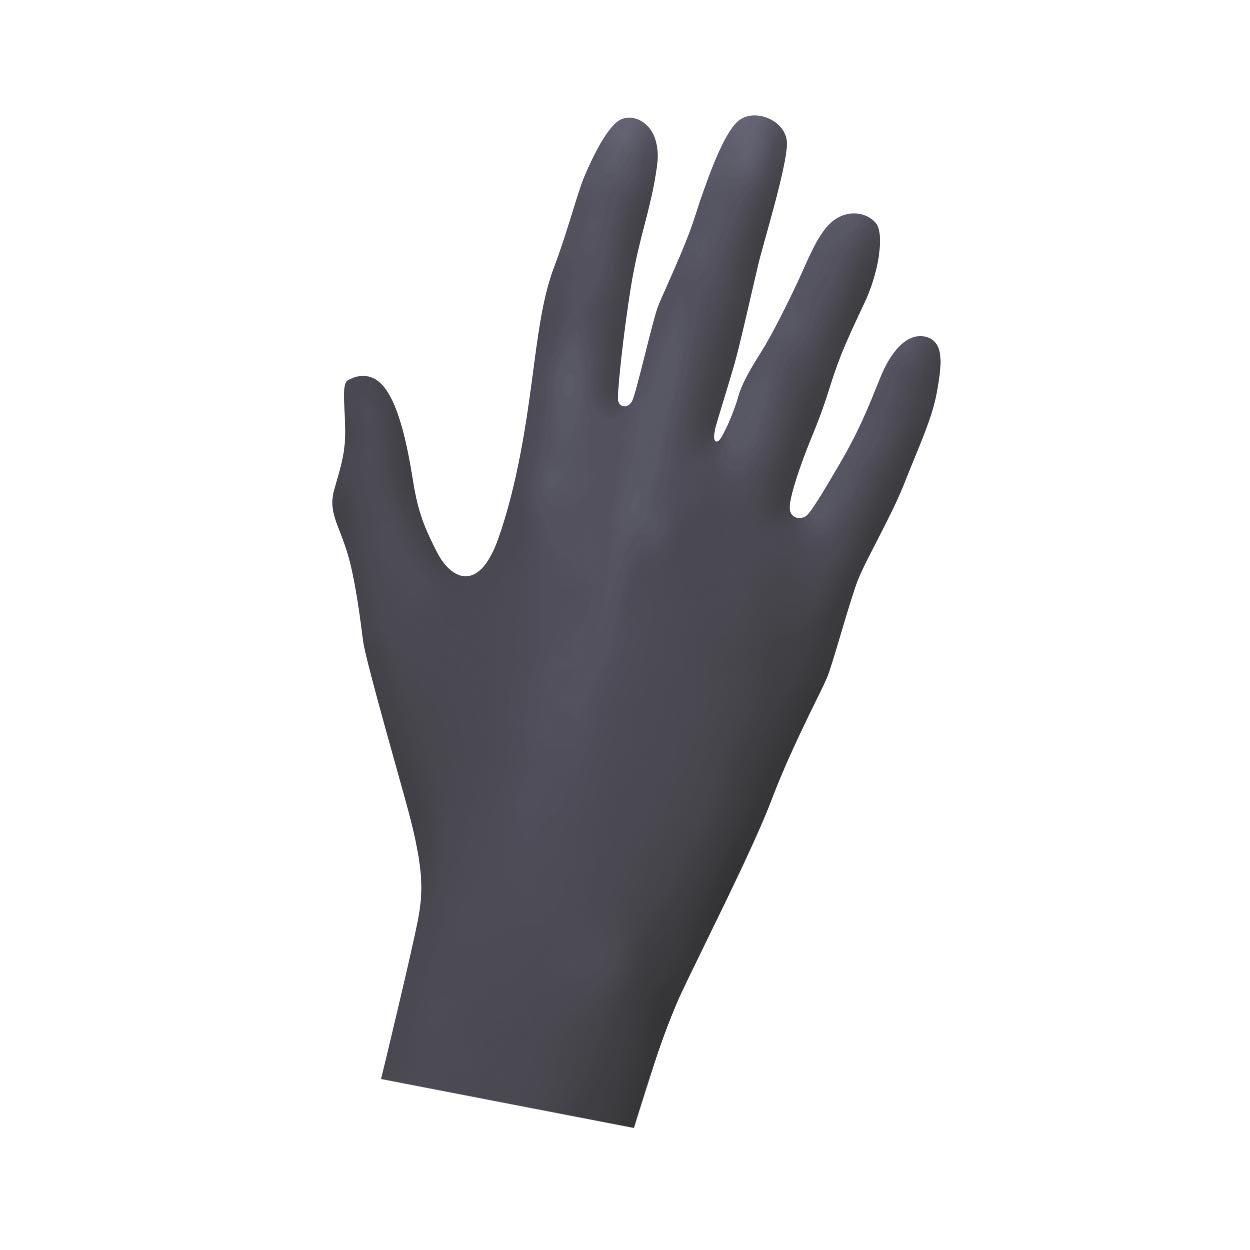 Guantes de nitrilo caja de 100 unidades, desechables Guantes Guantes, guantes, guantes nitrilo sin, sin lá tex, unsteril, sin lá tex sin látex D-Touch